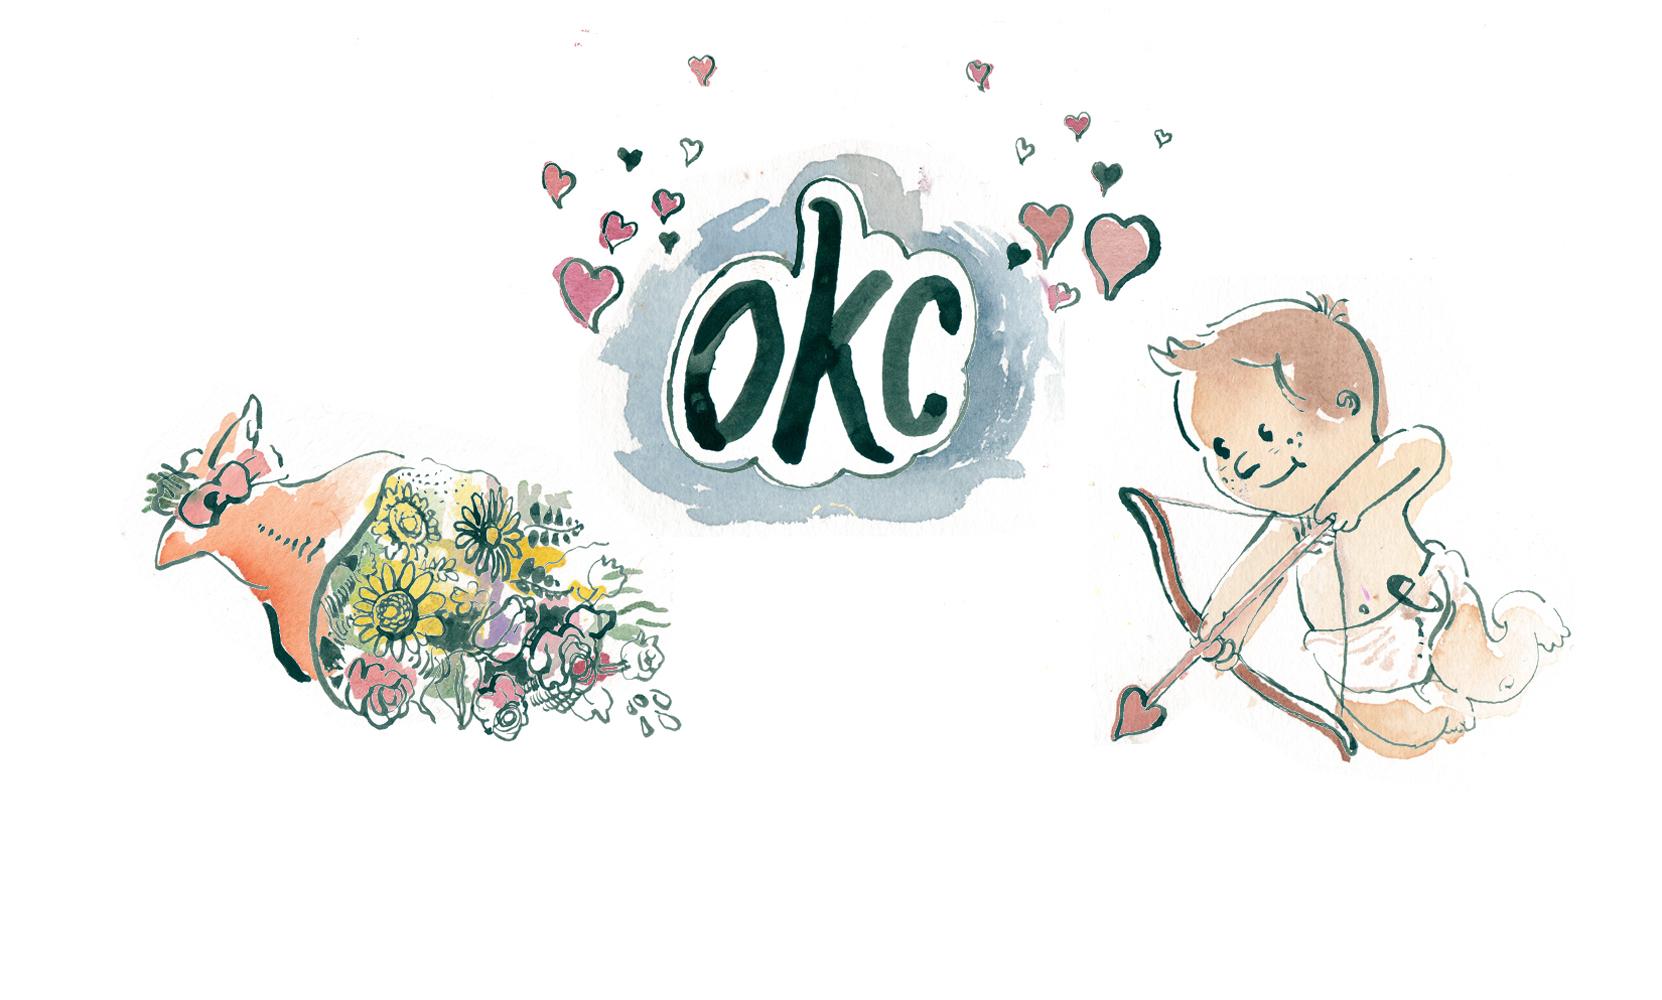 okc illustration